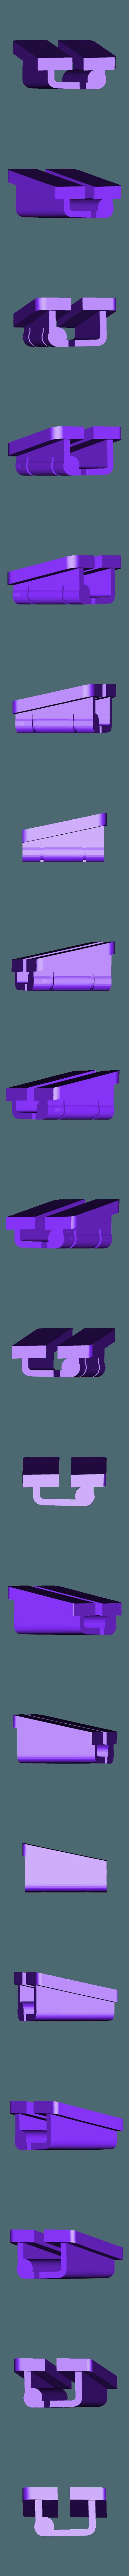 Hinge_BackTopRight.stl Descargar archivo STL CHEVY VAN G20 RC BODY SCALER AXIAL MST TRX4 RC4WD • Modelo para imprimir en 3D, ilyakapitonov